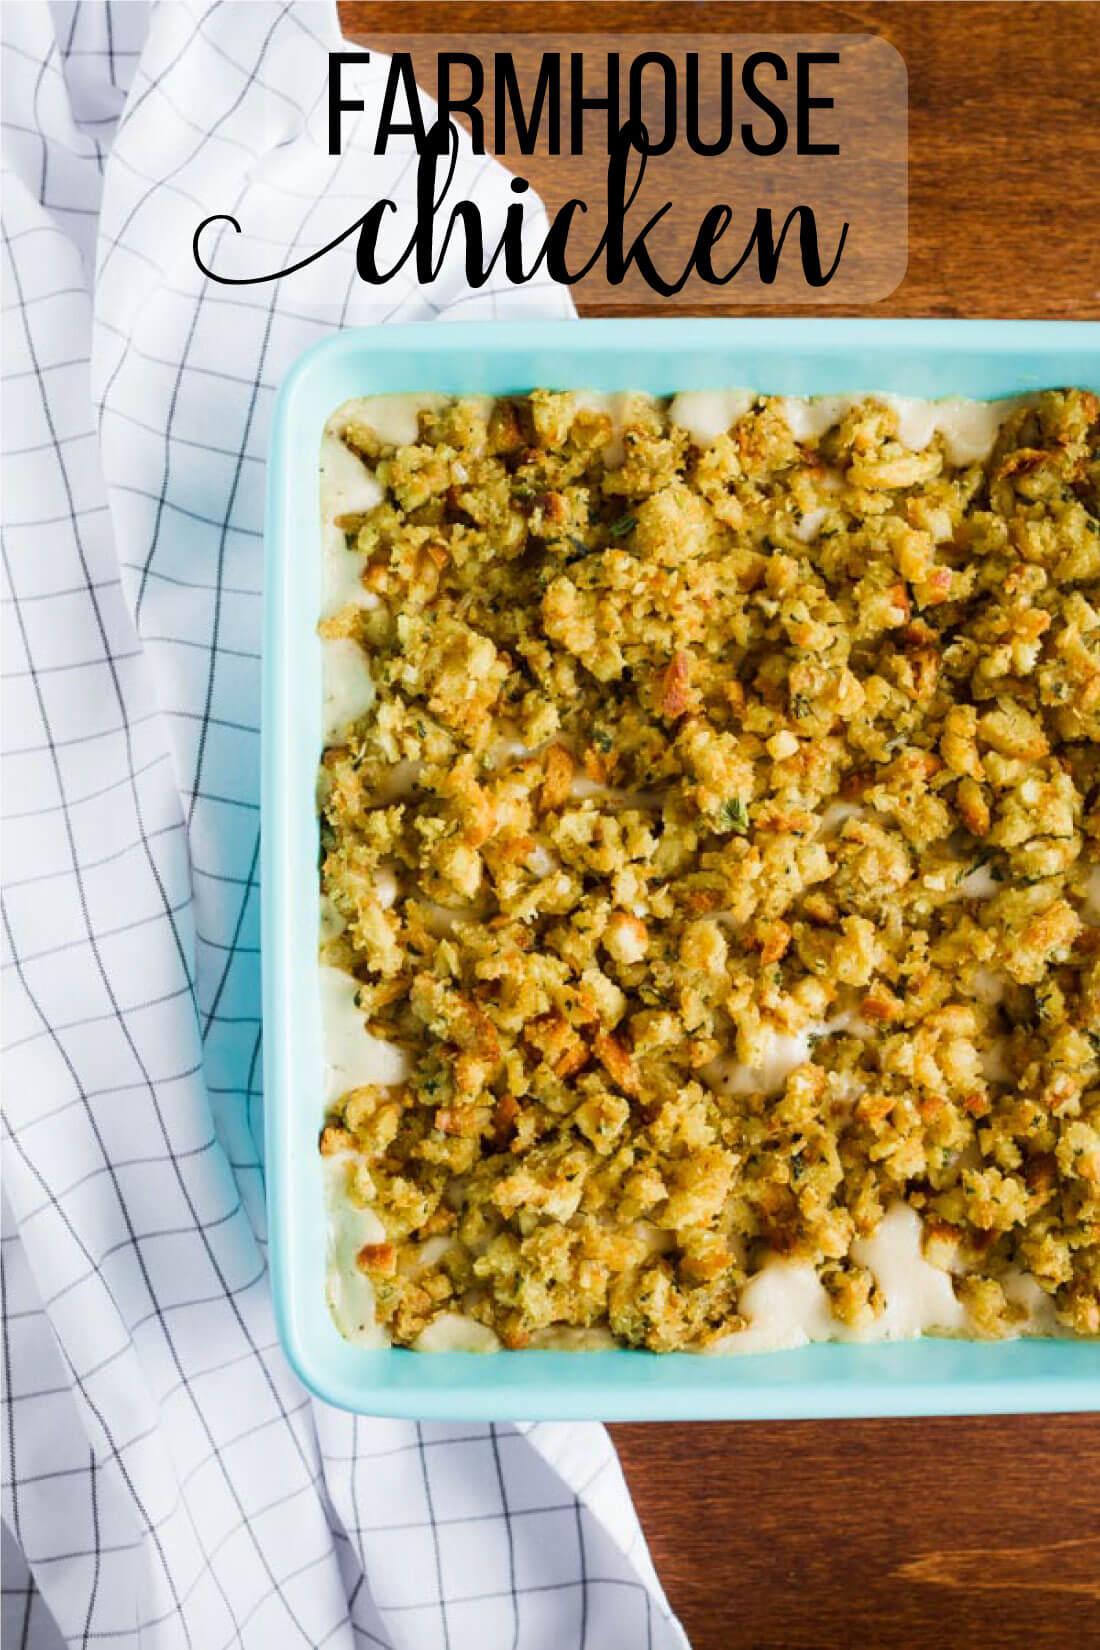 Easy Baked Chicken Recipes - Farmhouse Chicken - tasty and easy to make. www.thirtyhandmadedays.com